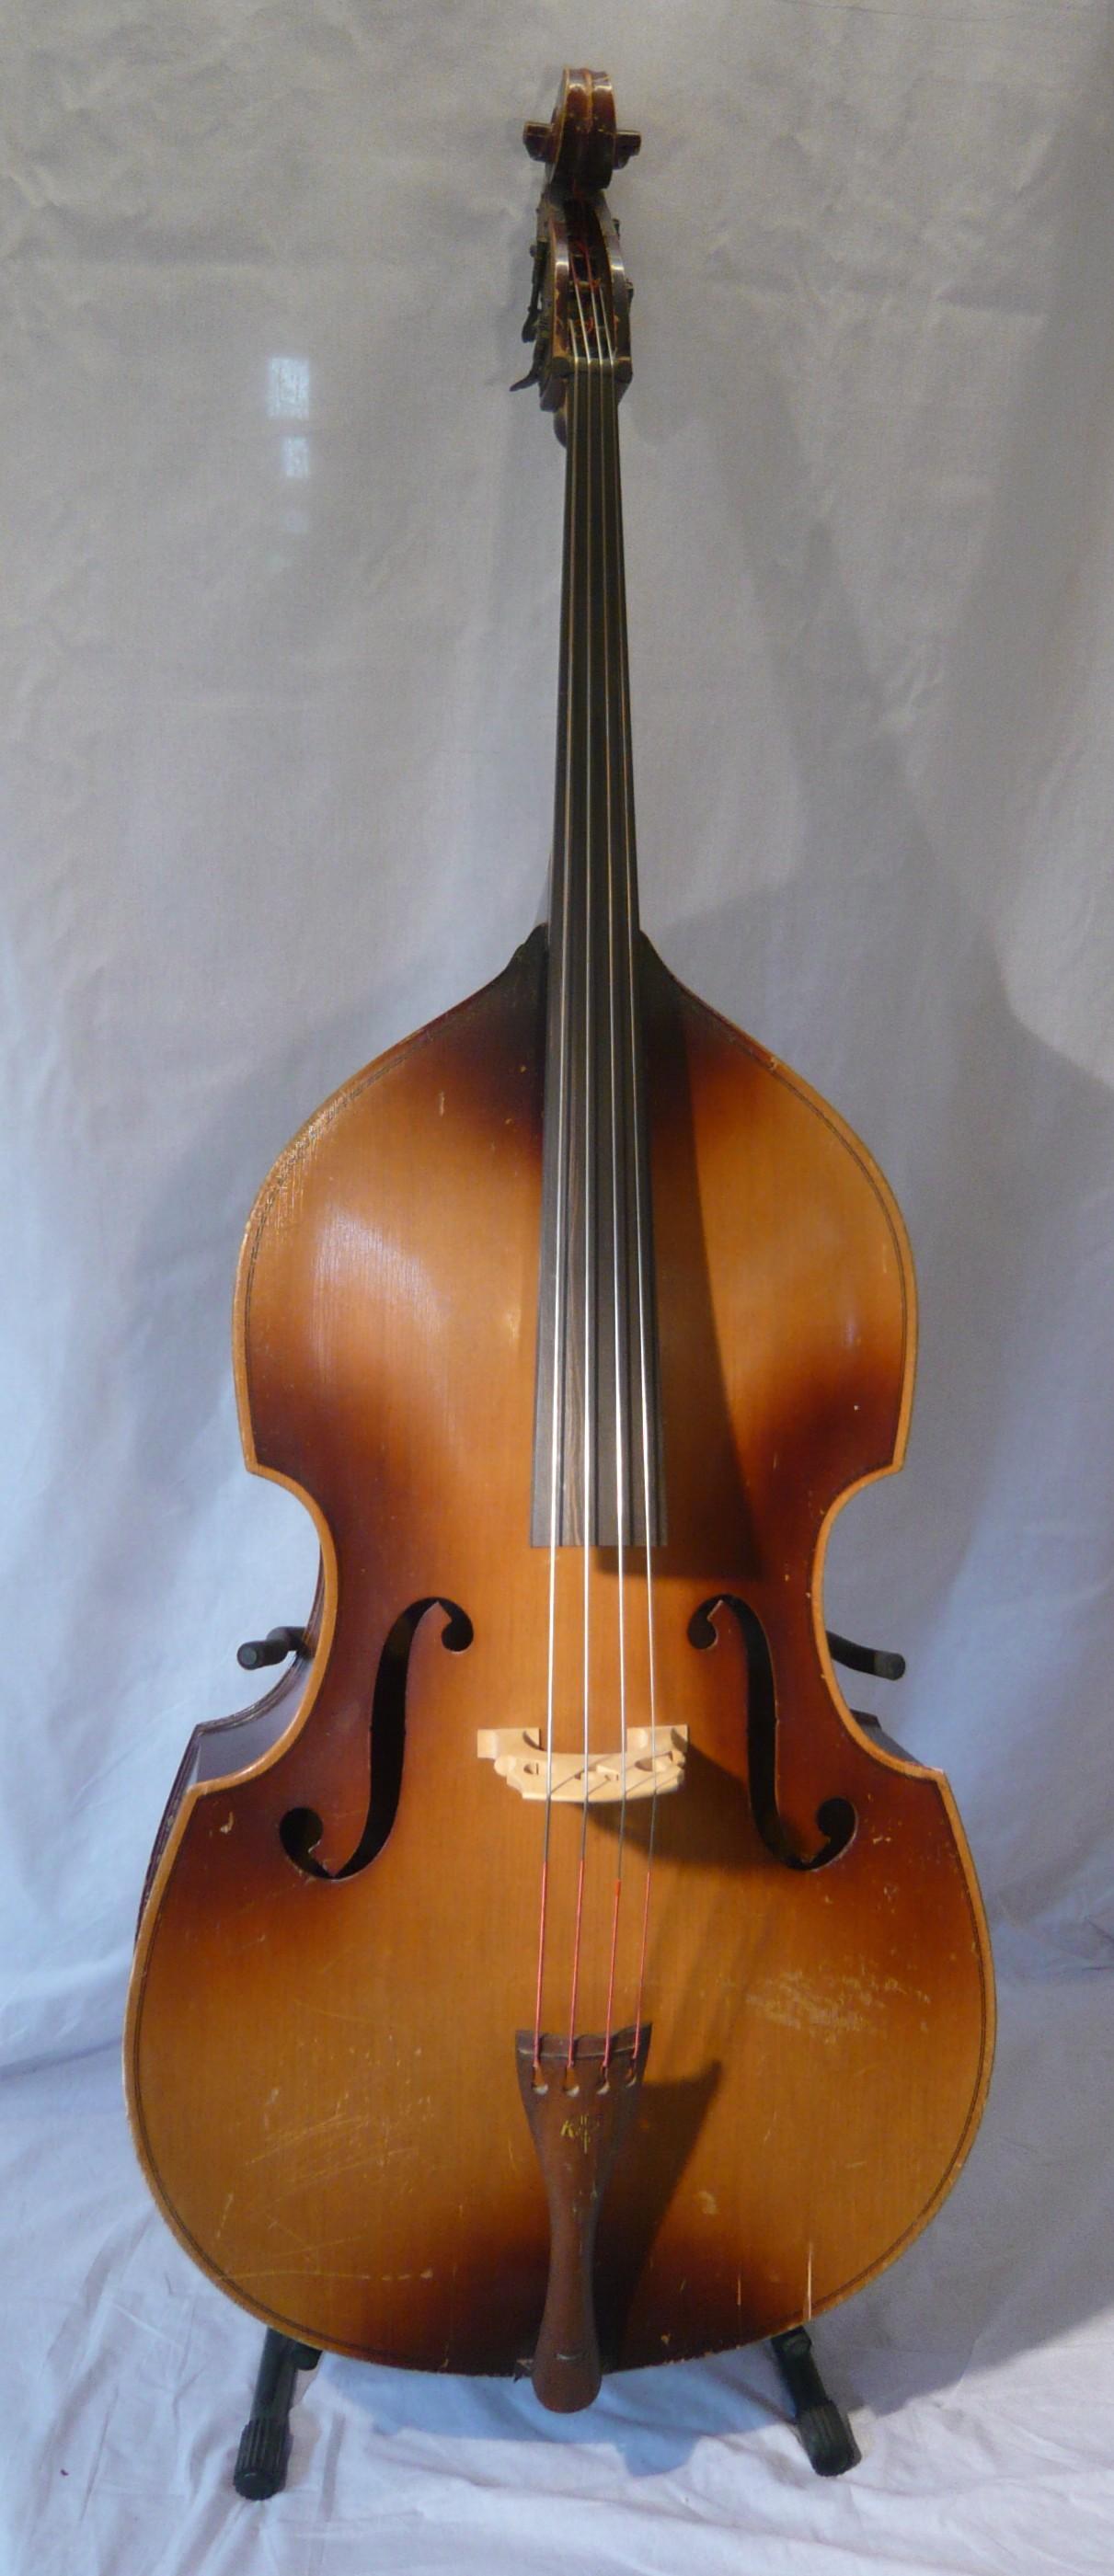 Copy of 1938 Kay C-1